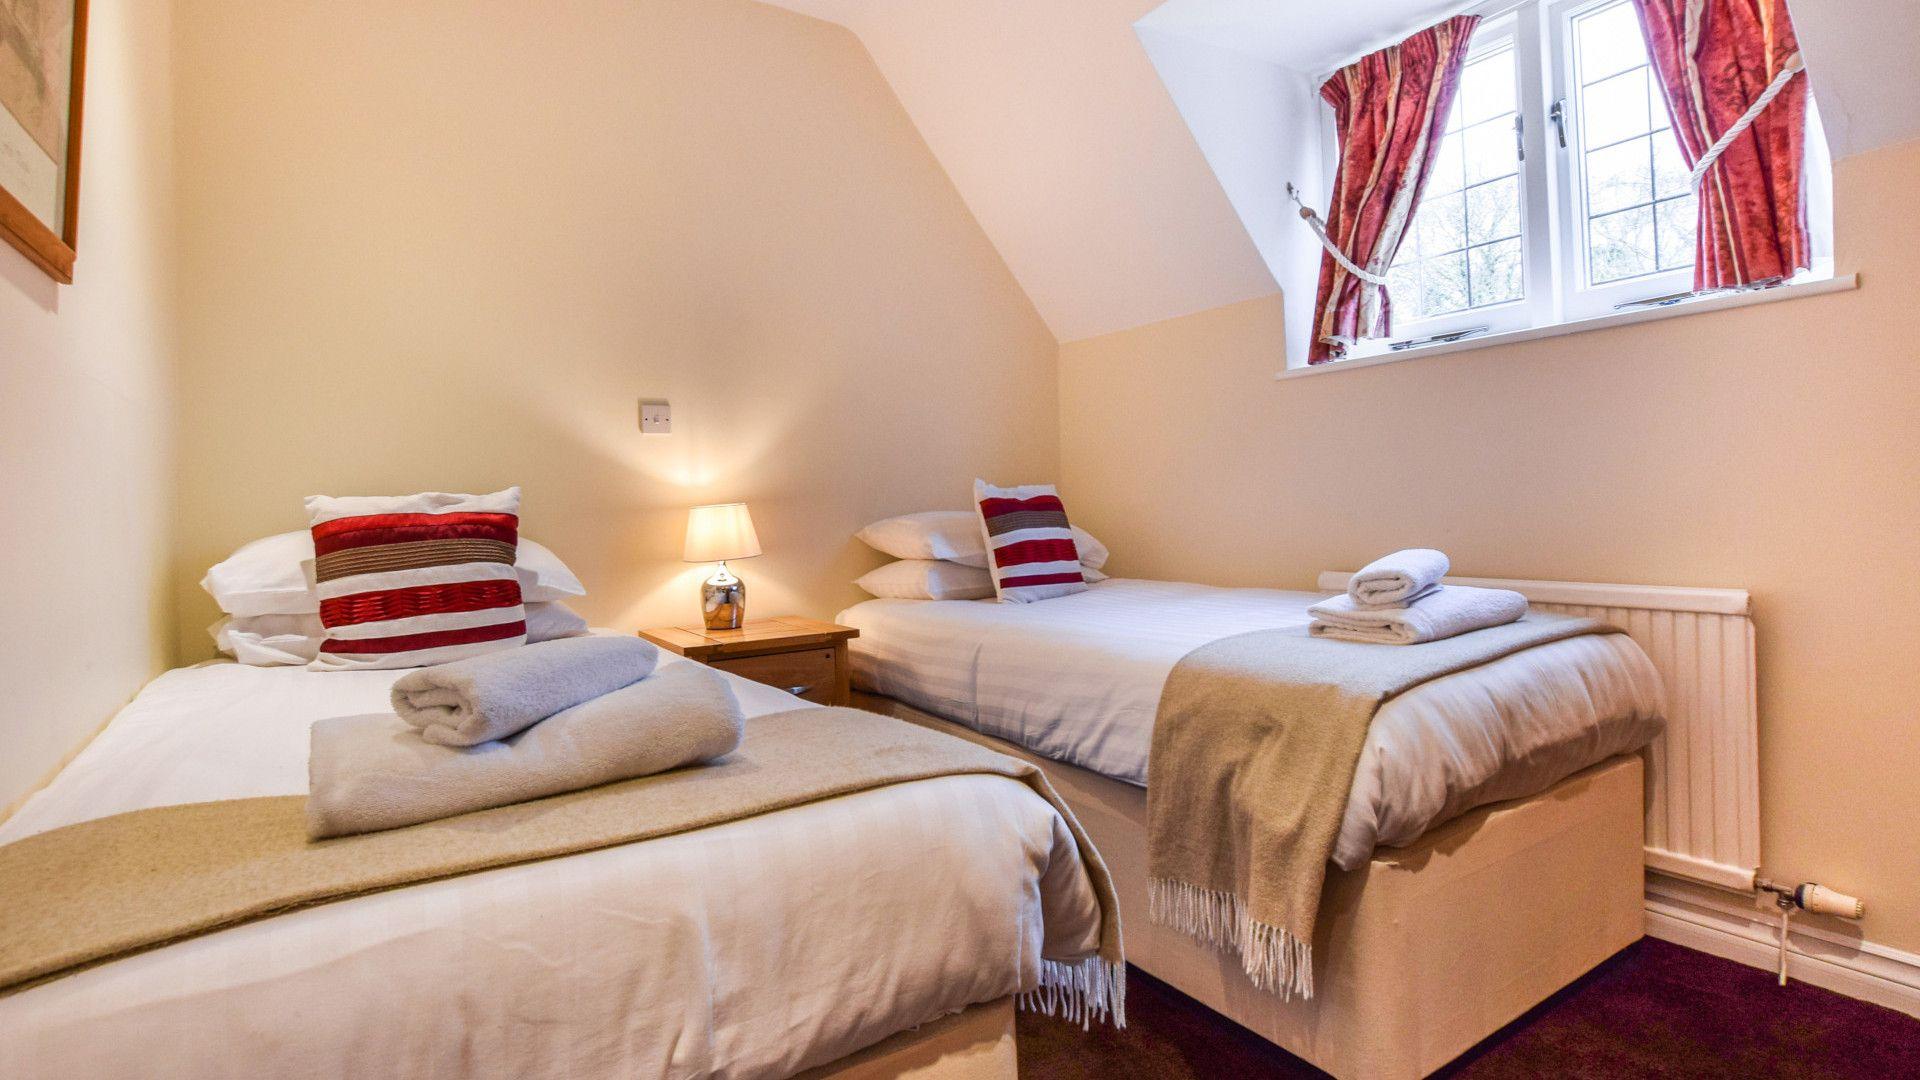 Bedroom 2, twin, Anne Boleyn Cottage at Sudeley Castle, Bolthole Retreats